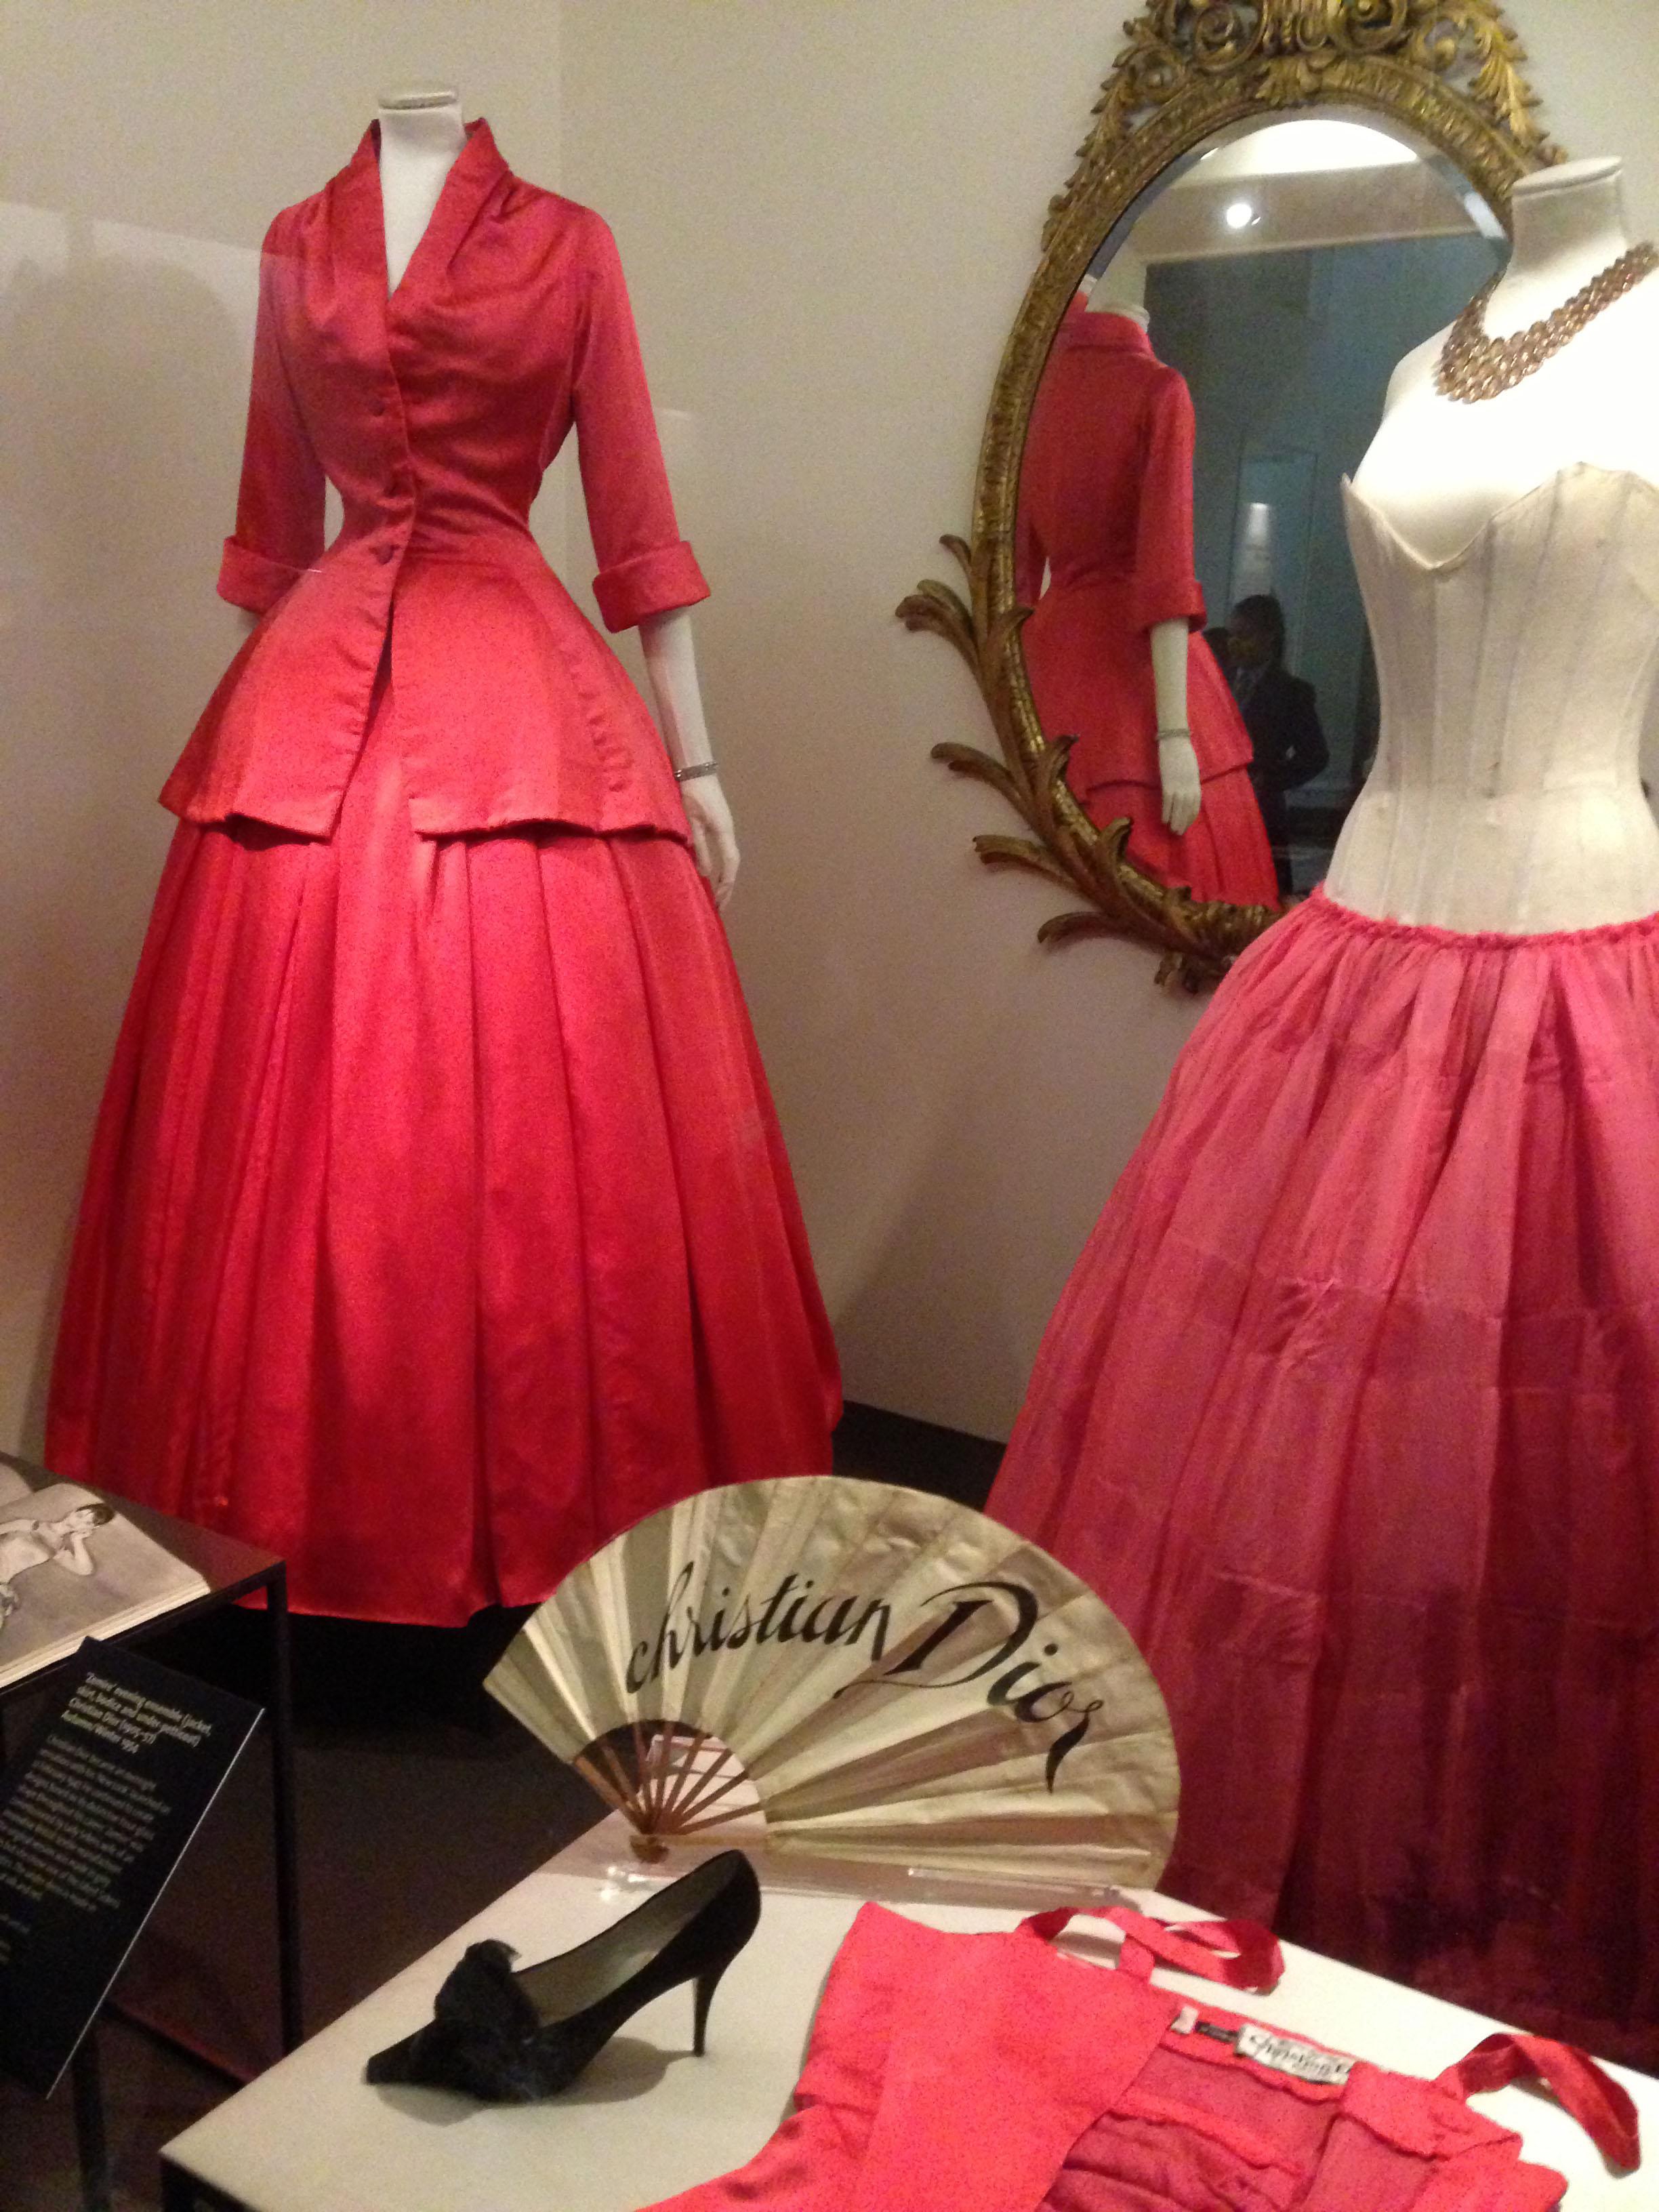 V&A fashion 3